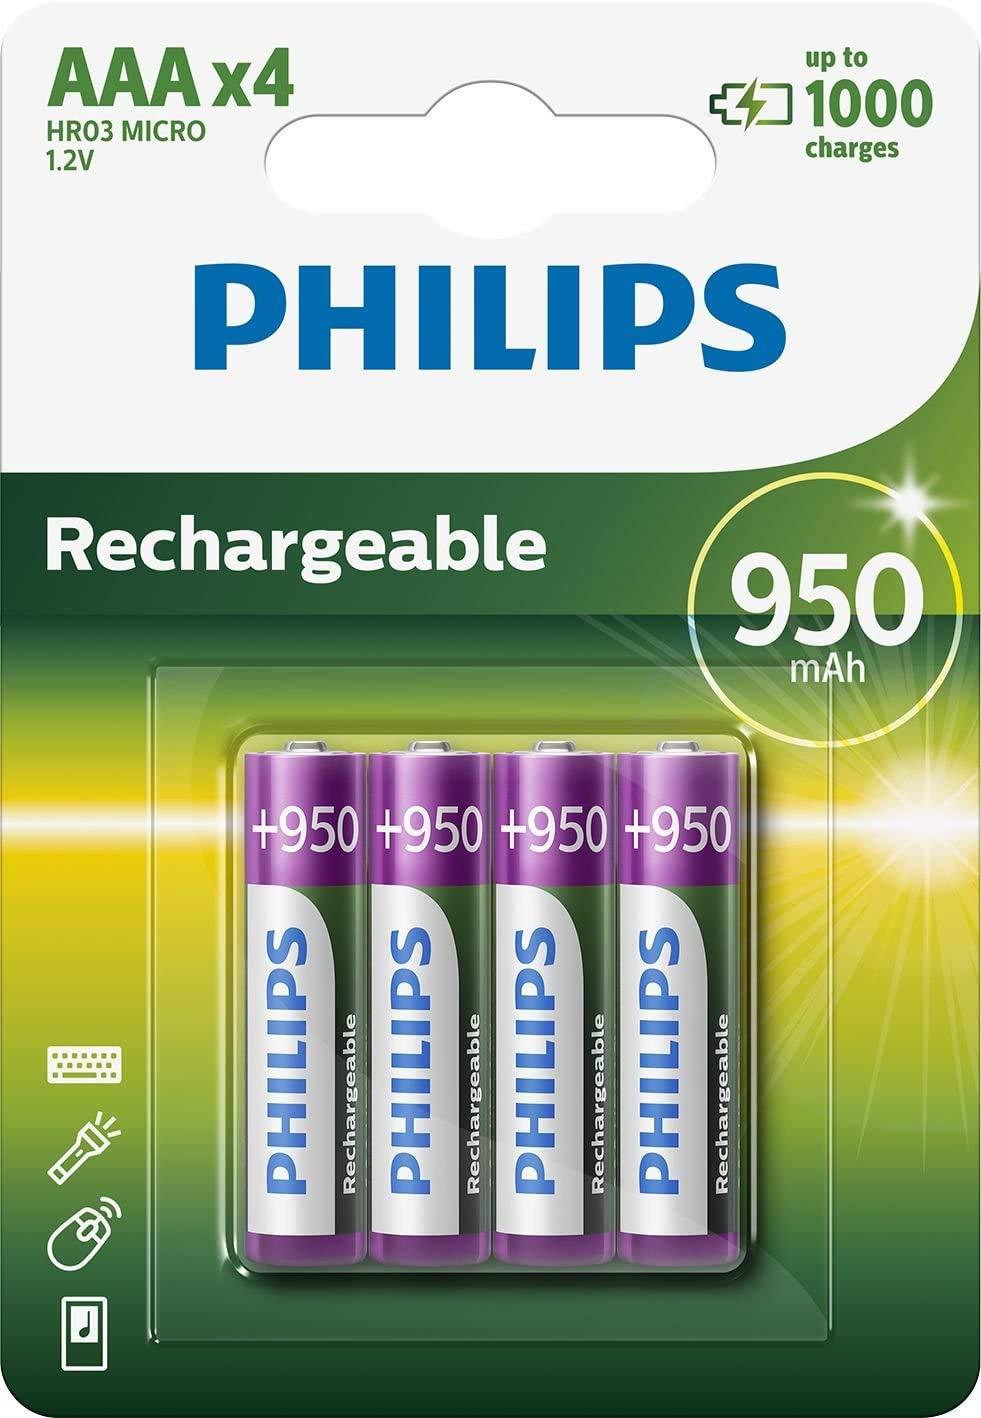 Philips R03B4A95/10 - Pack de 4 pilas recargables (NiMh, AAA Micro): Amazon.es: Electrónica